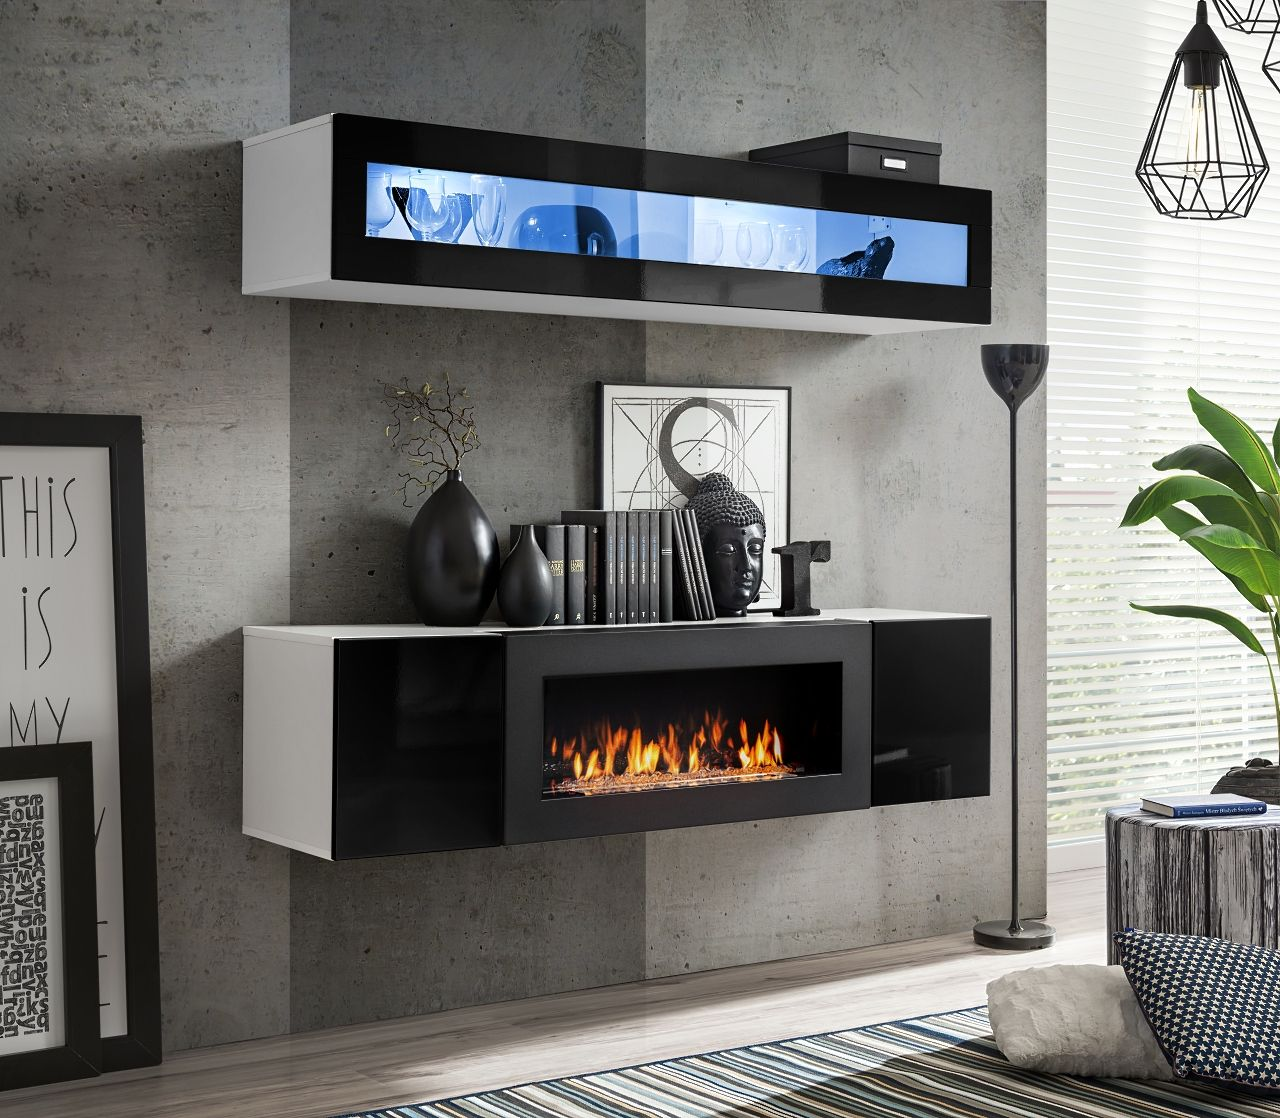 Idea N2 Meuble Tv Home Cinema Meuble Tv Design Meuble Tv Led Meuble De Television